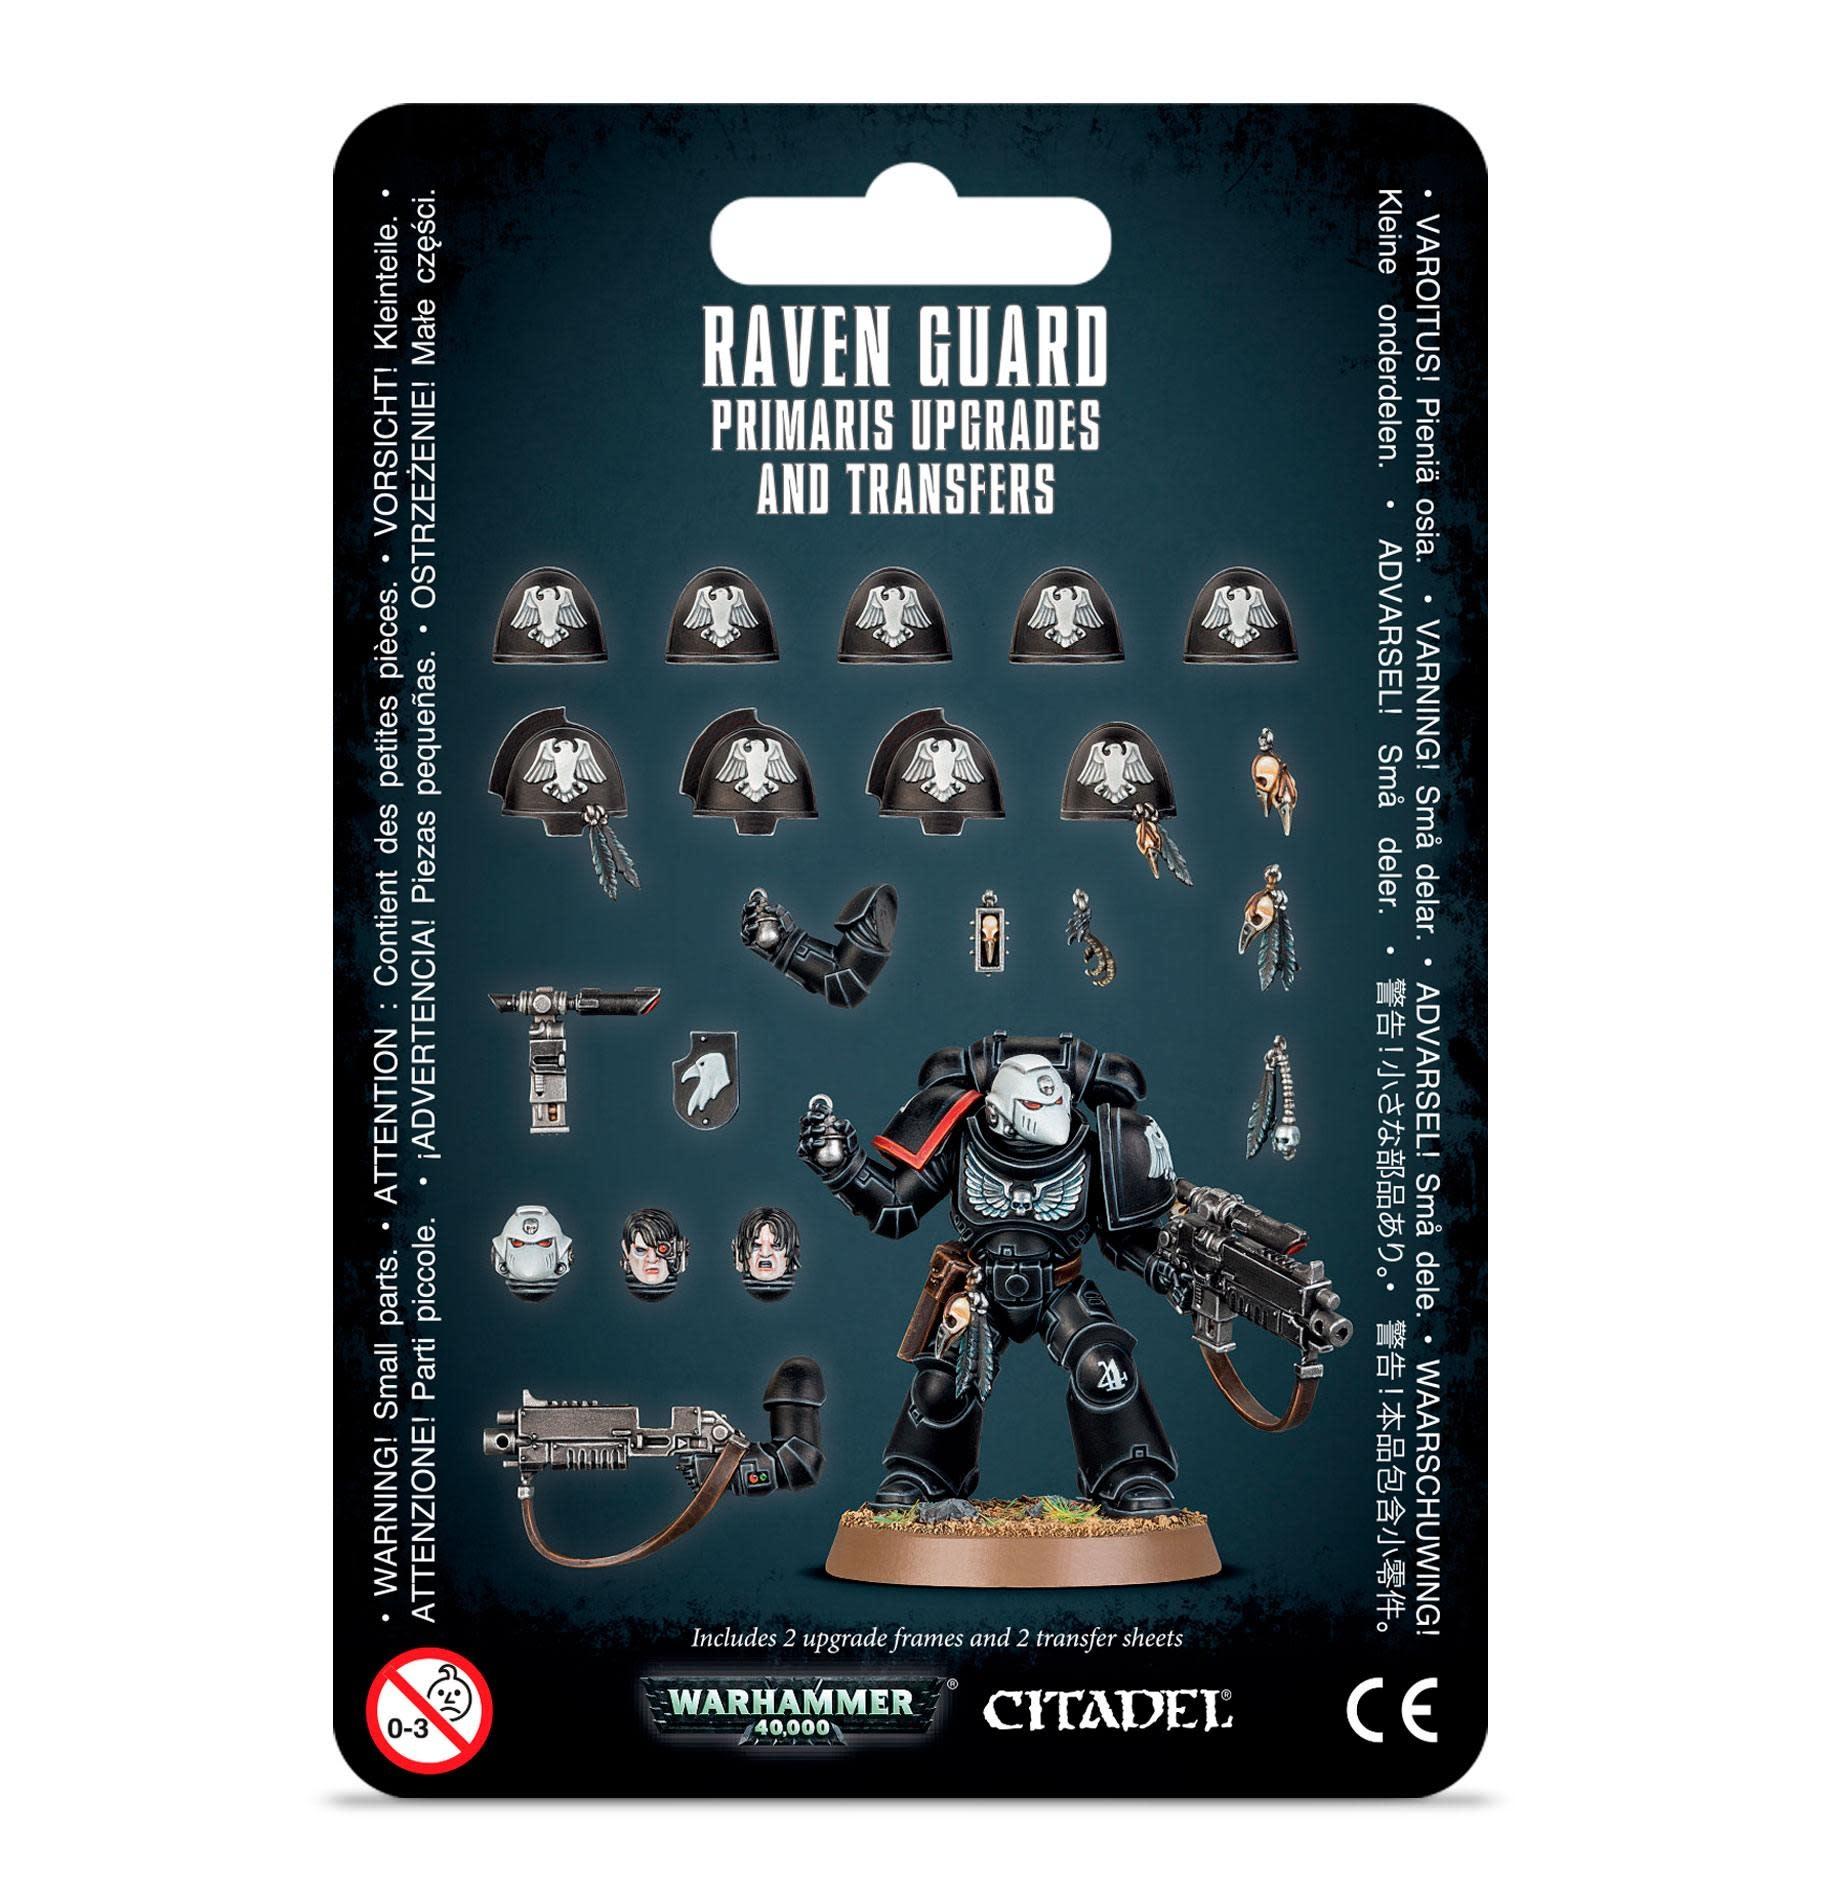 Games Workshop Raven Guard Primaris Upgrades and Transfers